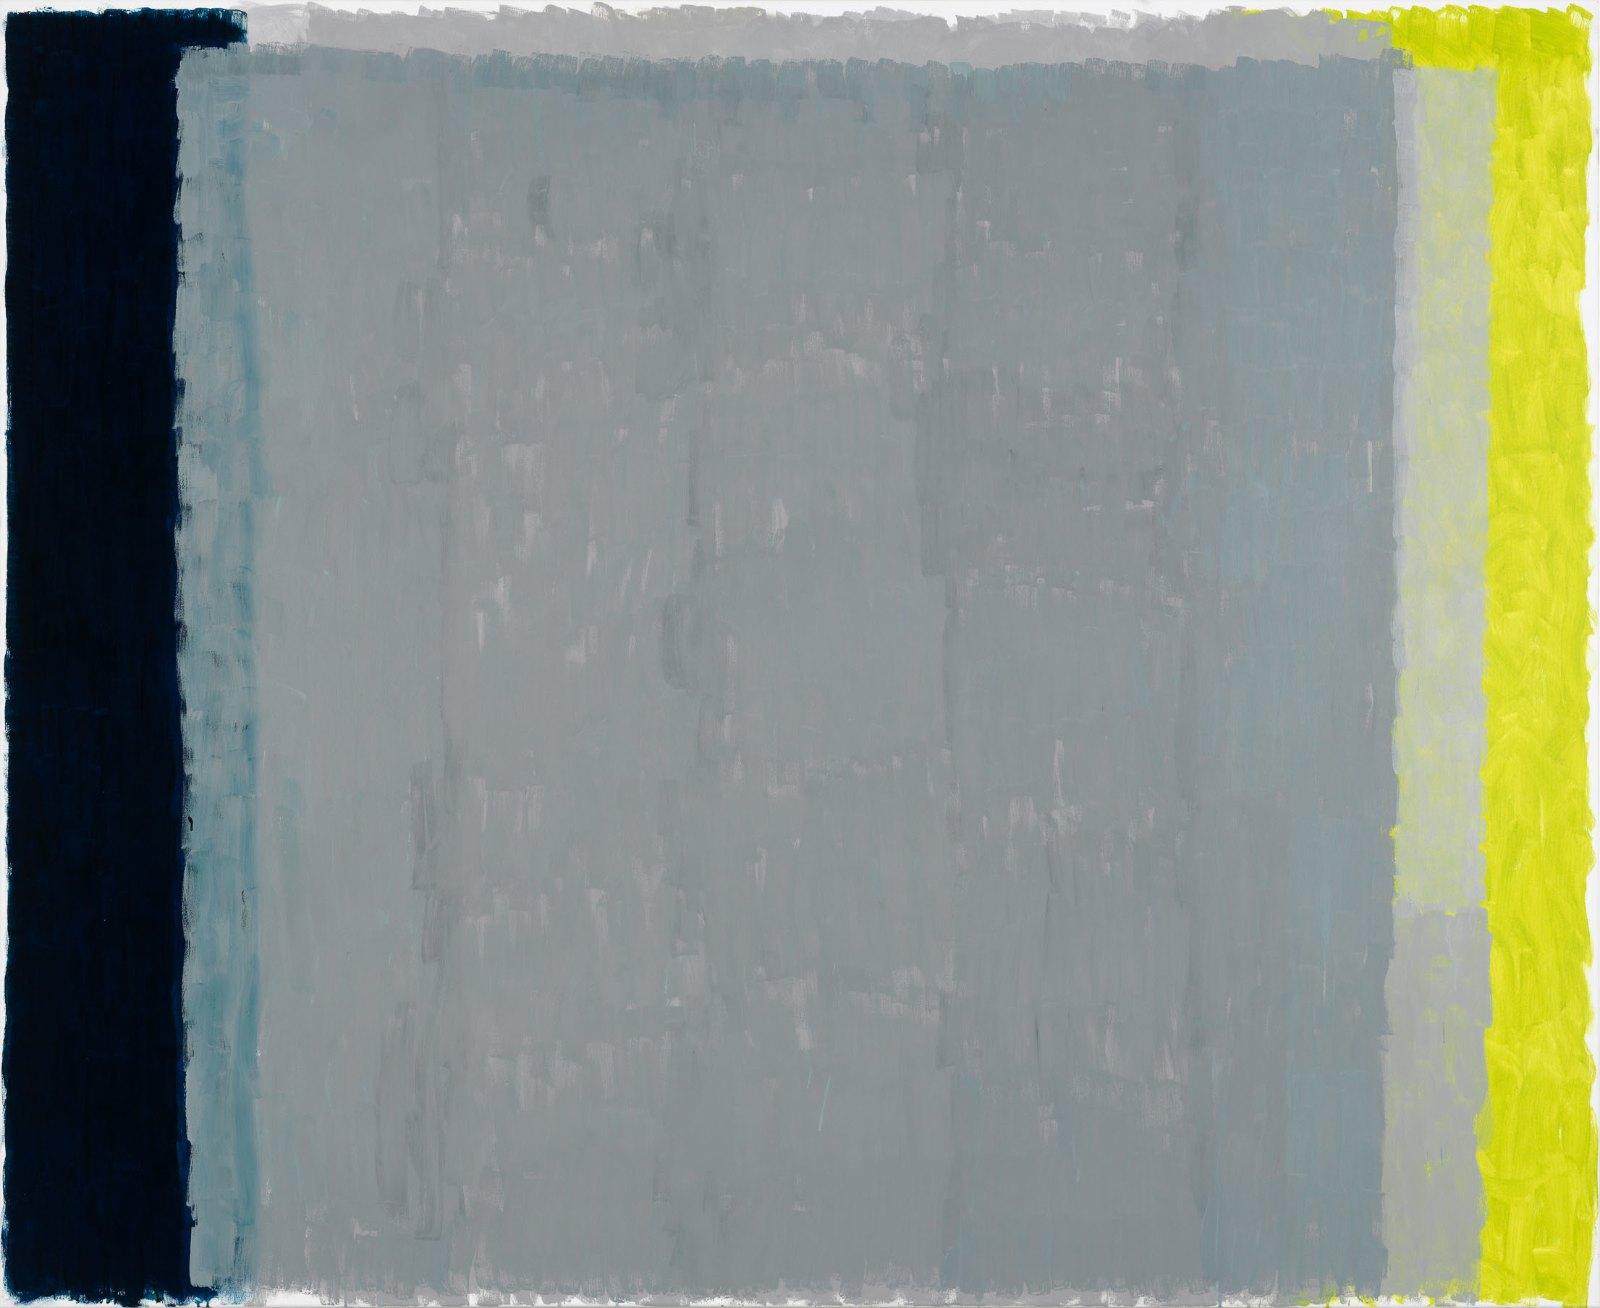 Løren # 8, 2015, egg tempera on cotton, 180 x 220 cm